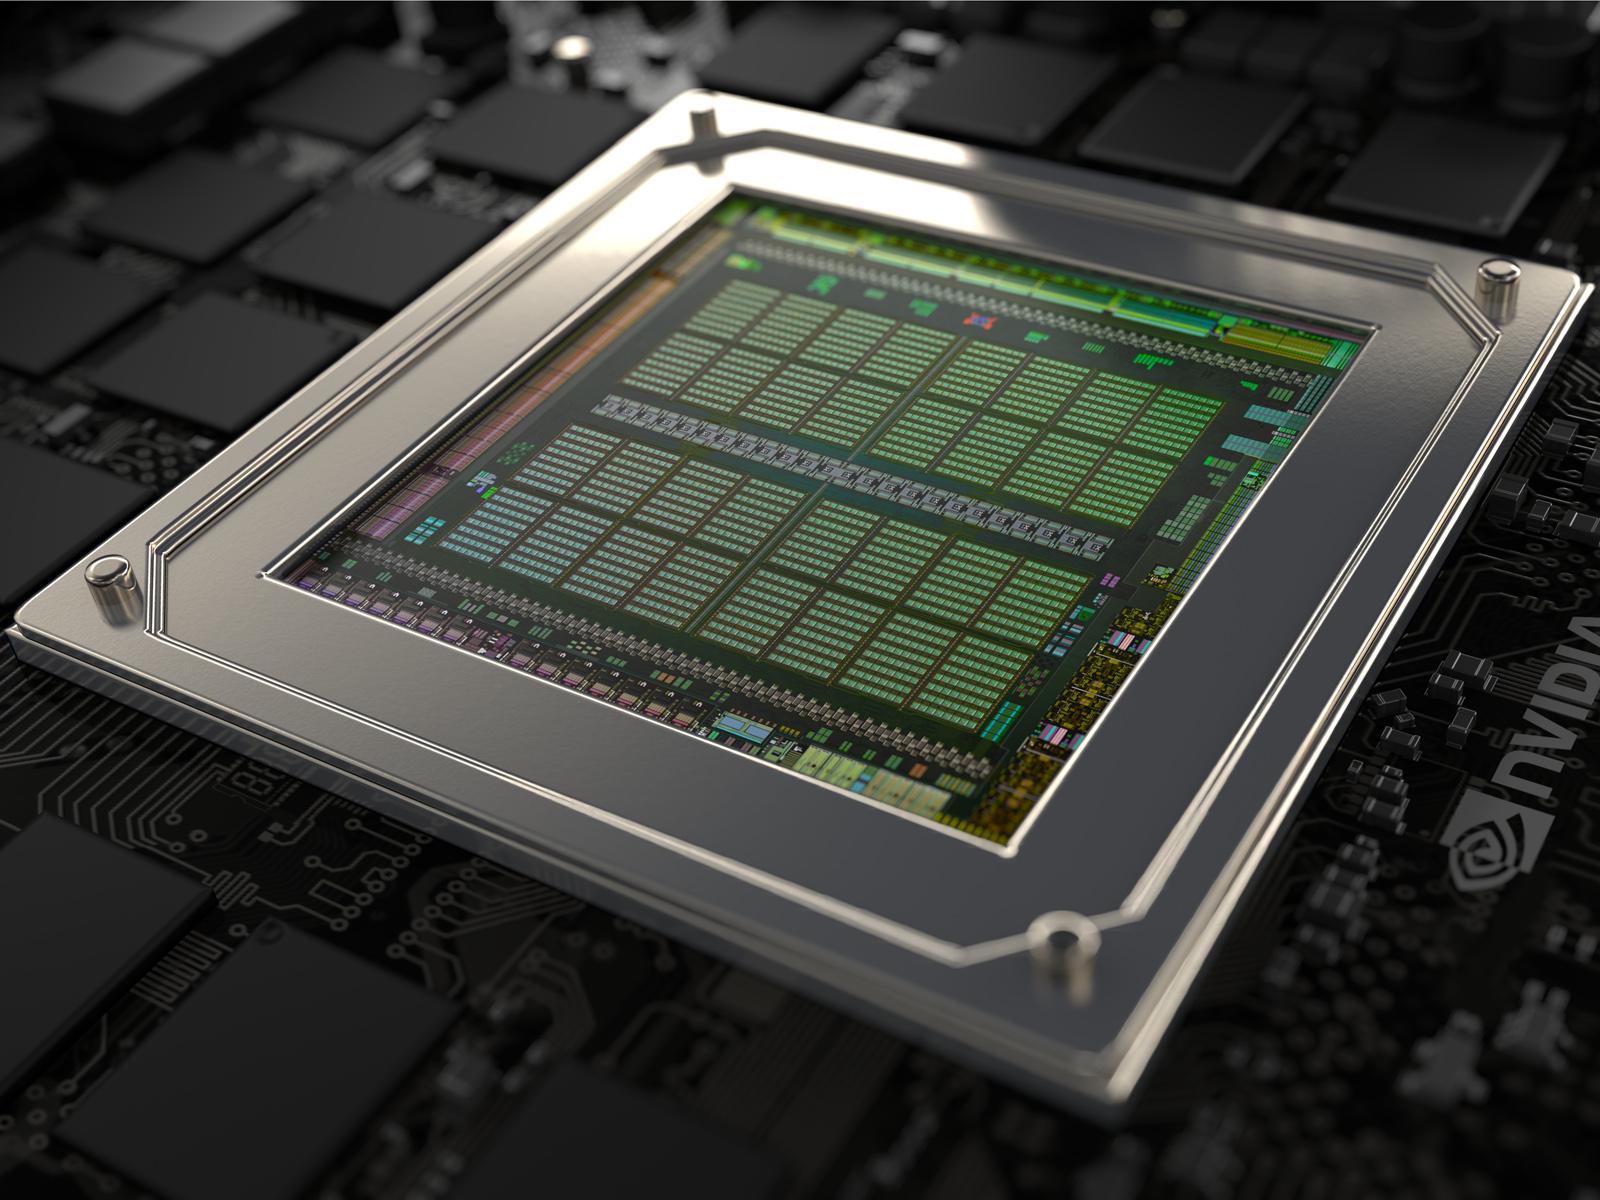 Nvidia GeForce GTX 970M